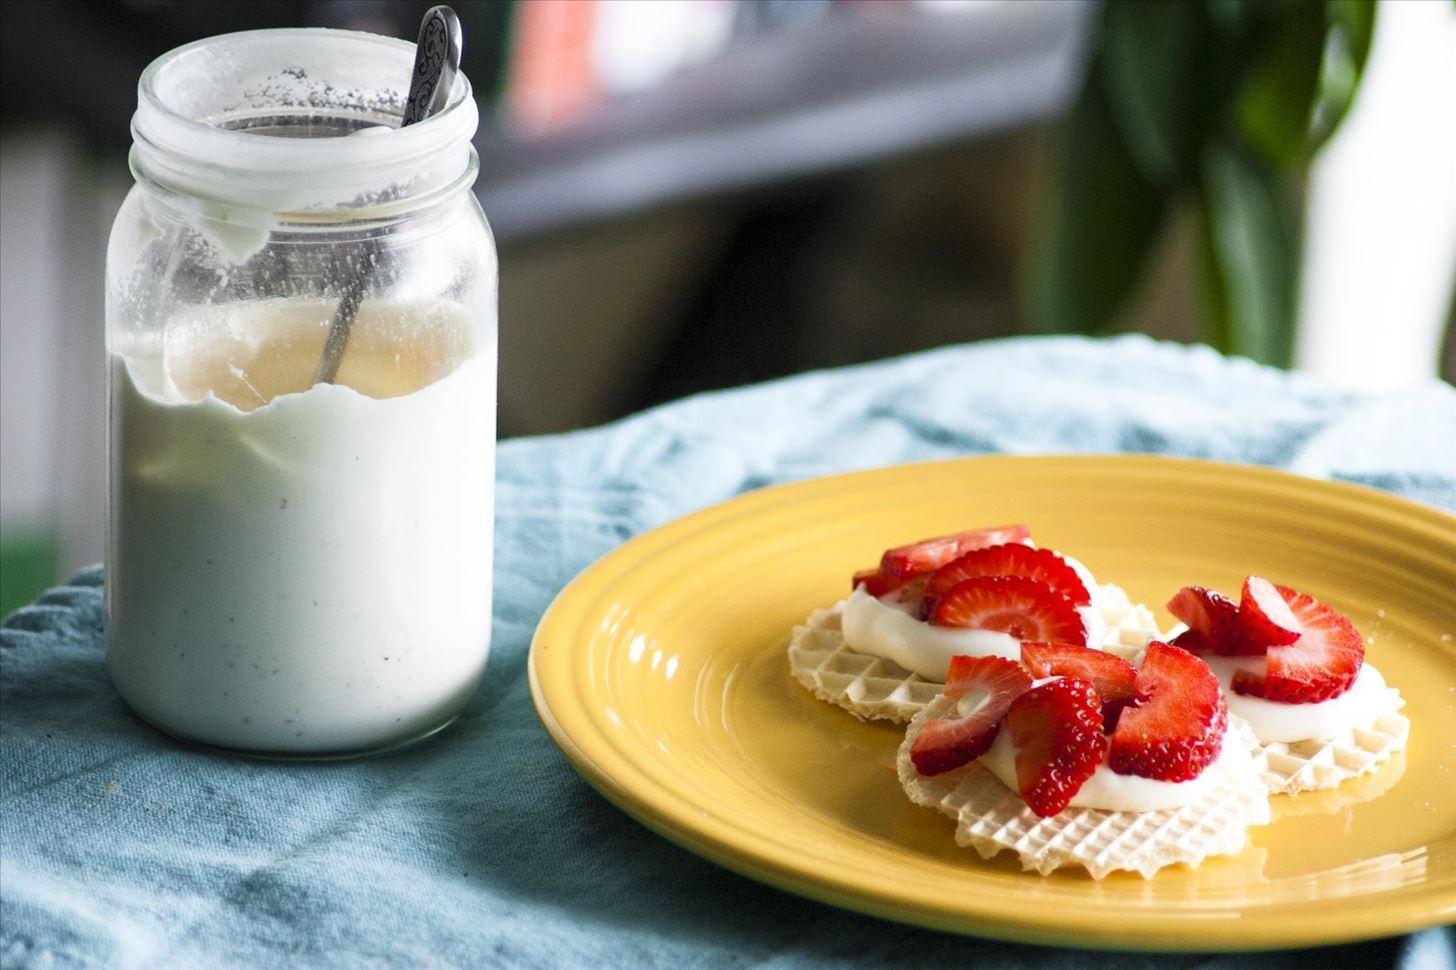 5 Awesome Culinary Uses for Mason Jars